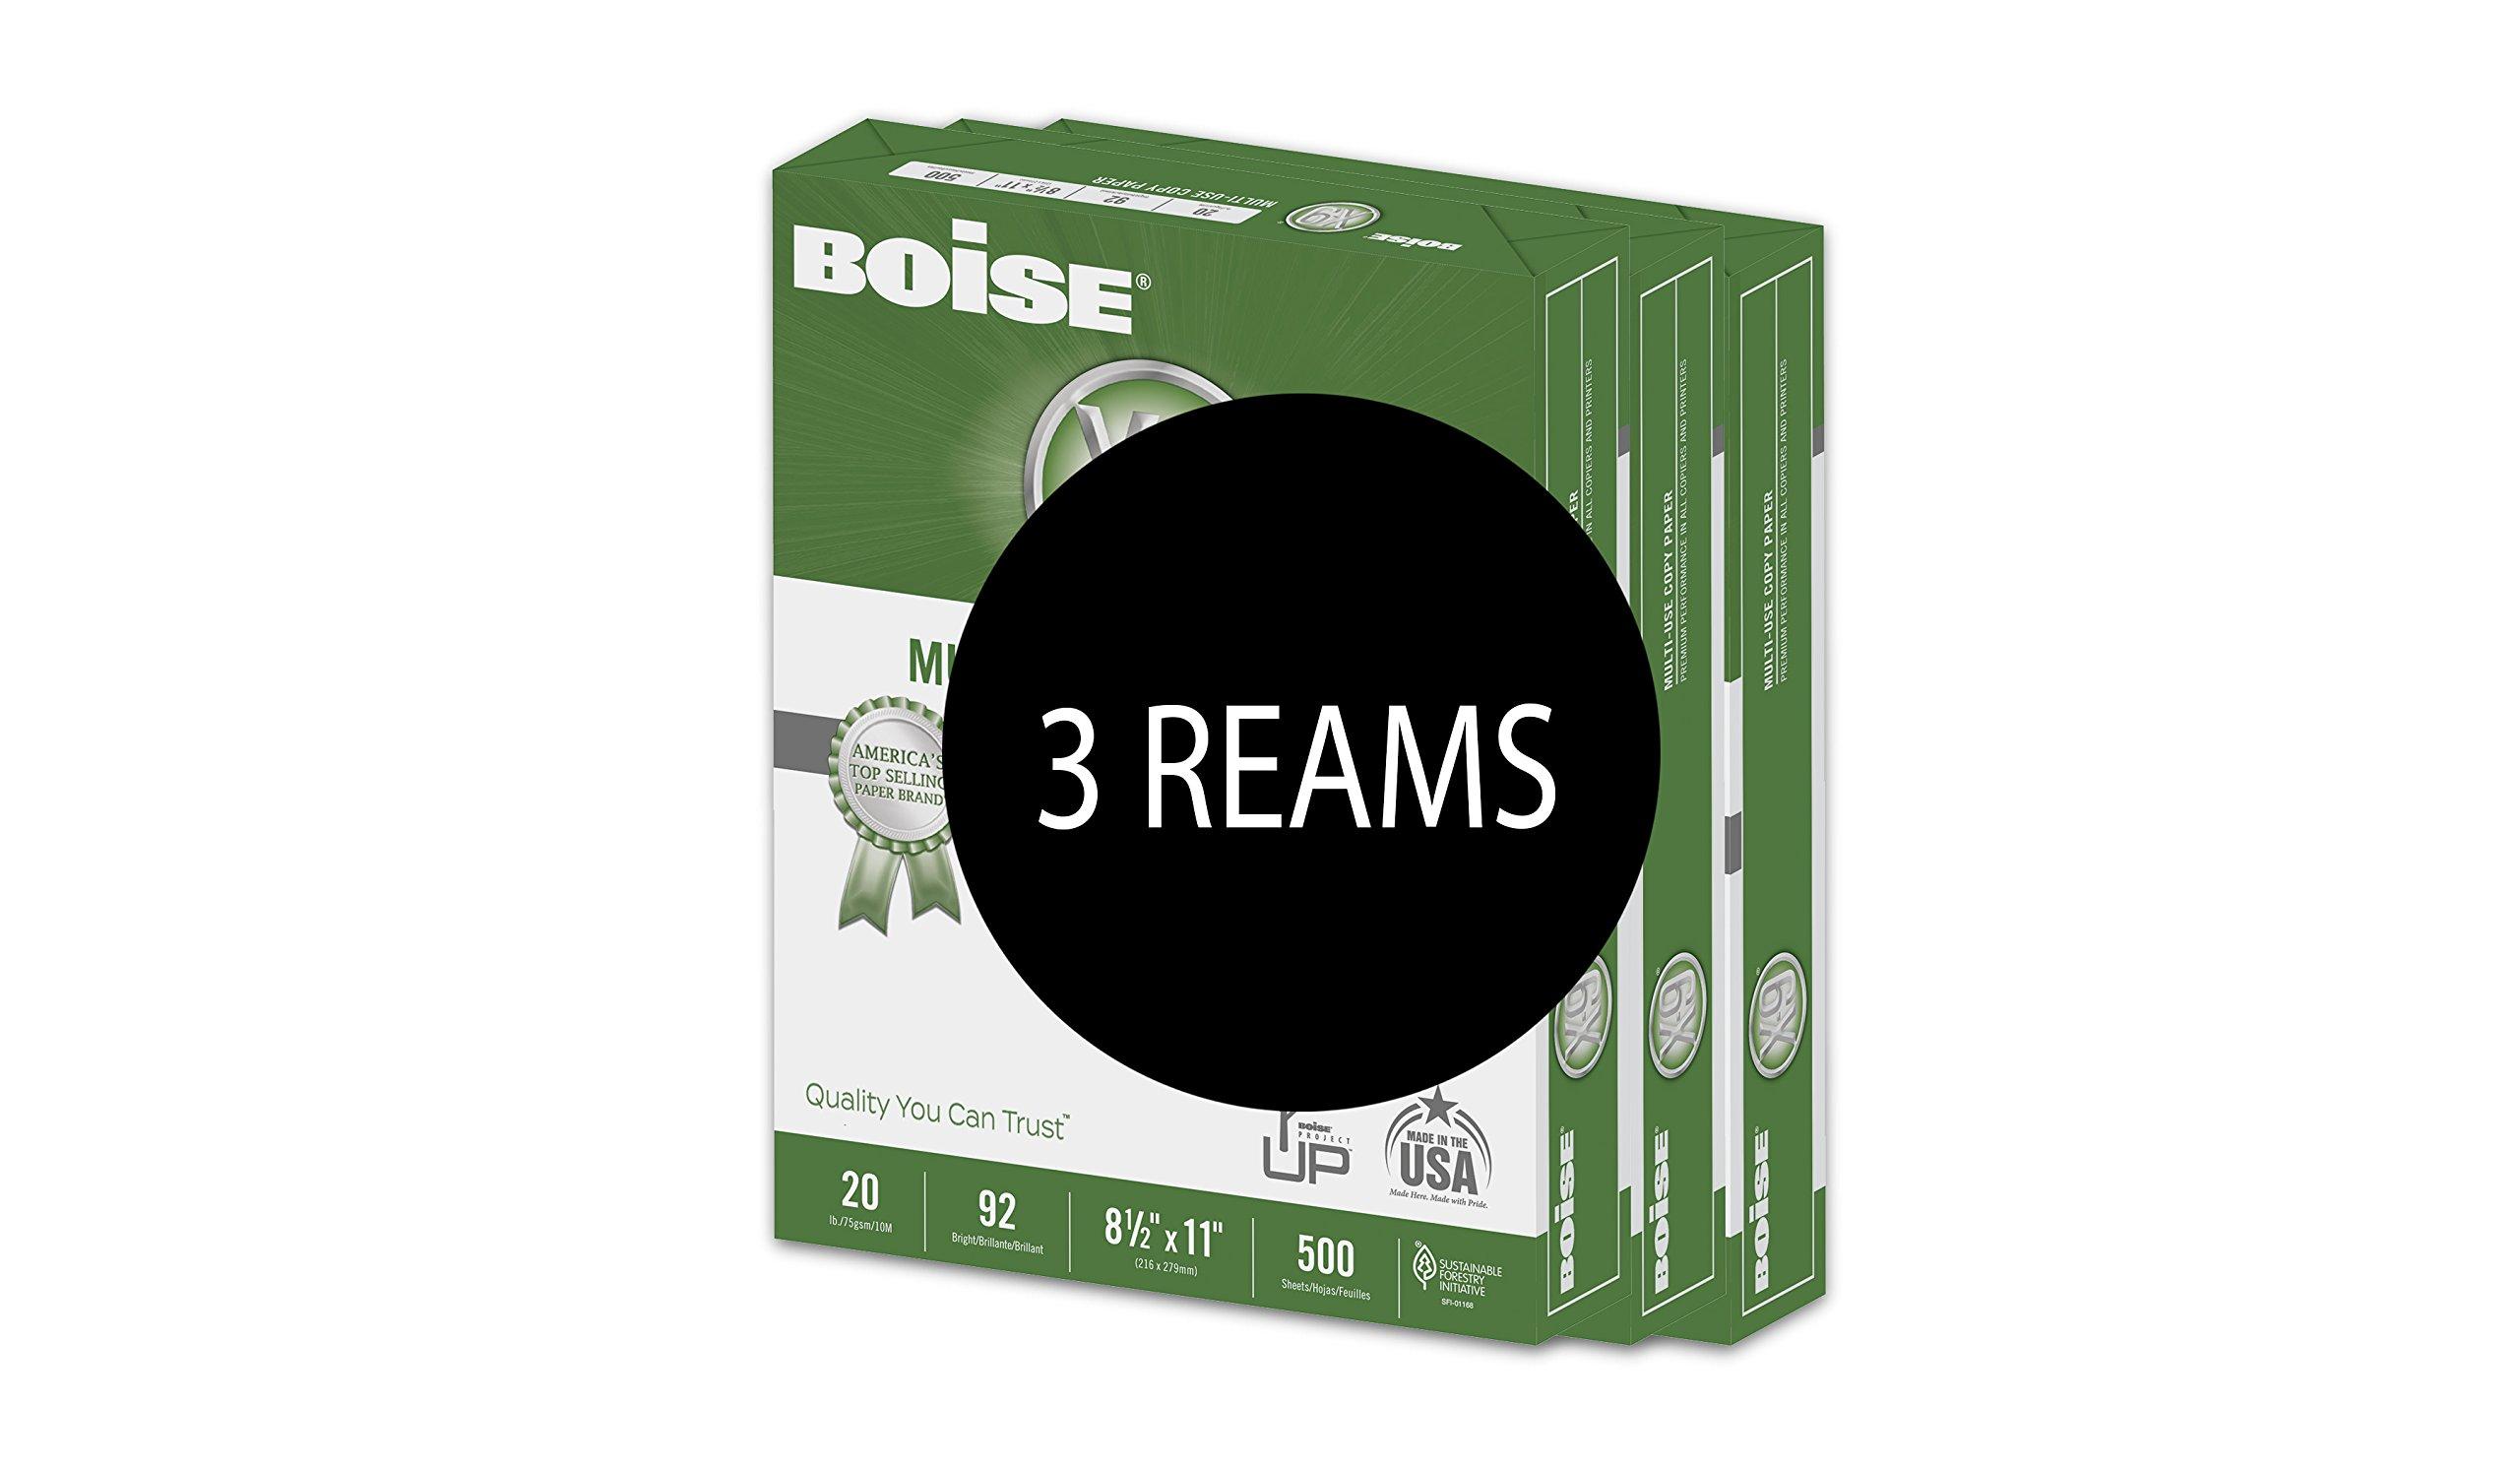 BOISE X-9 Multi-Use Copy Paper, 8.5 x 11, 92 Bright White, 20 lb, 3 ream carton (1,500 Sheets) by Boise Paper (Image #2)